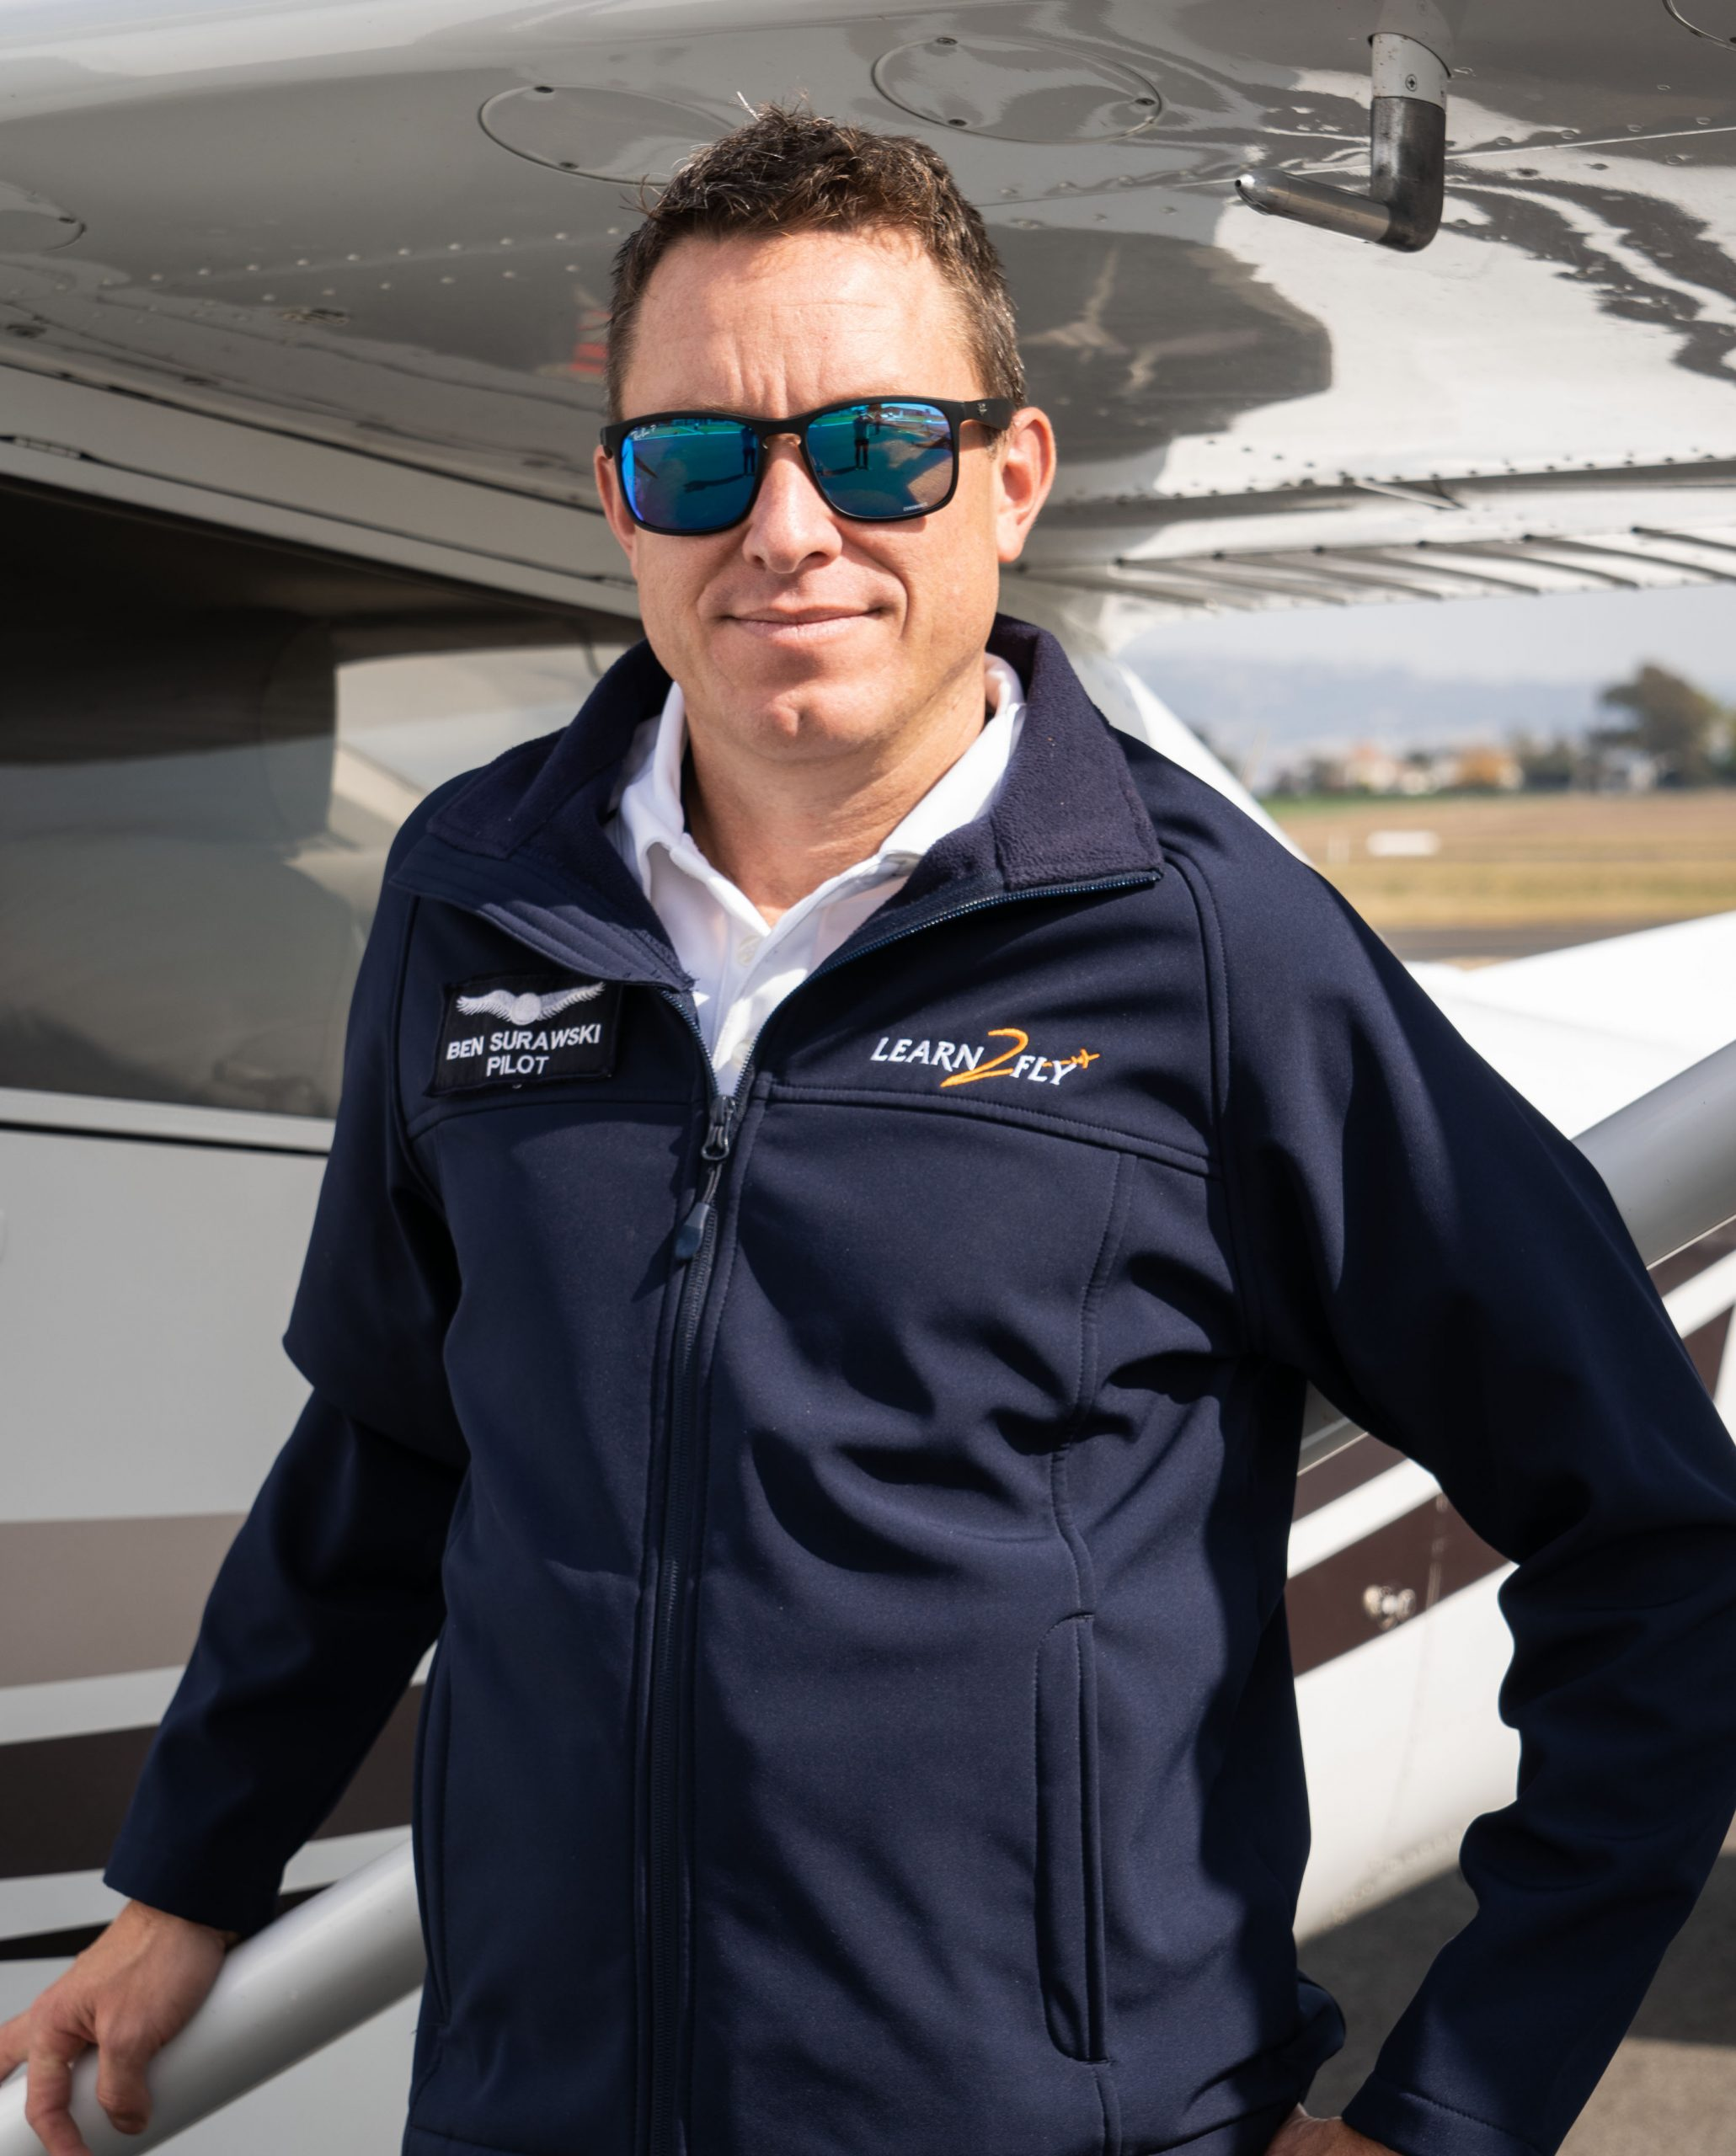 Learn 2 Fly CEO